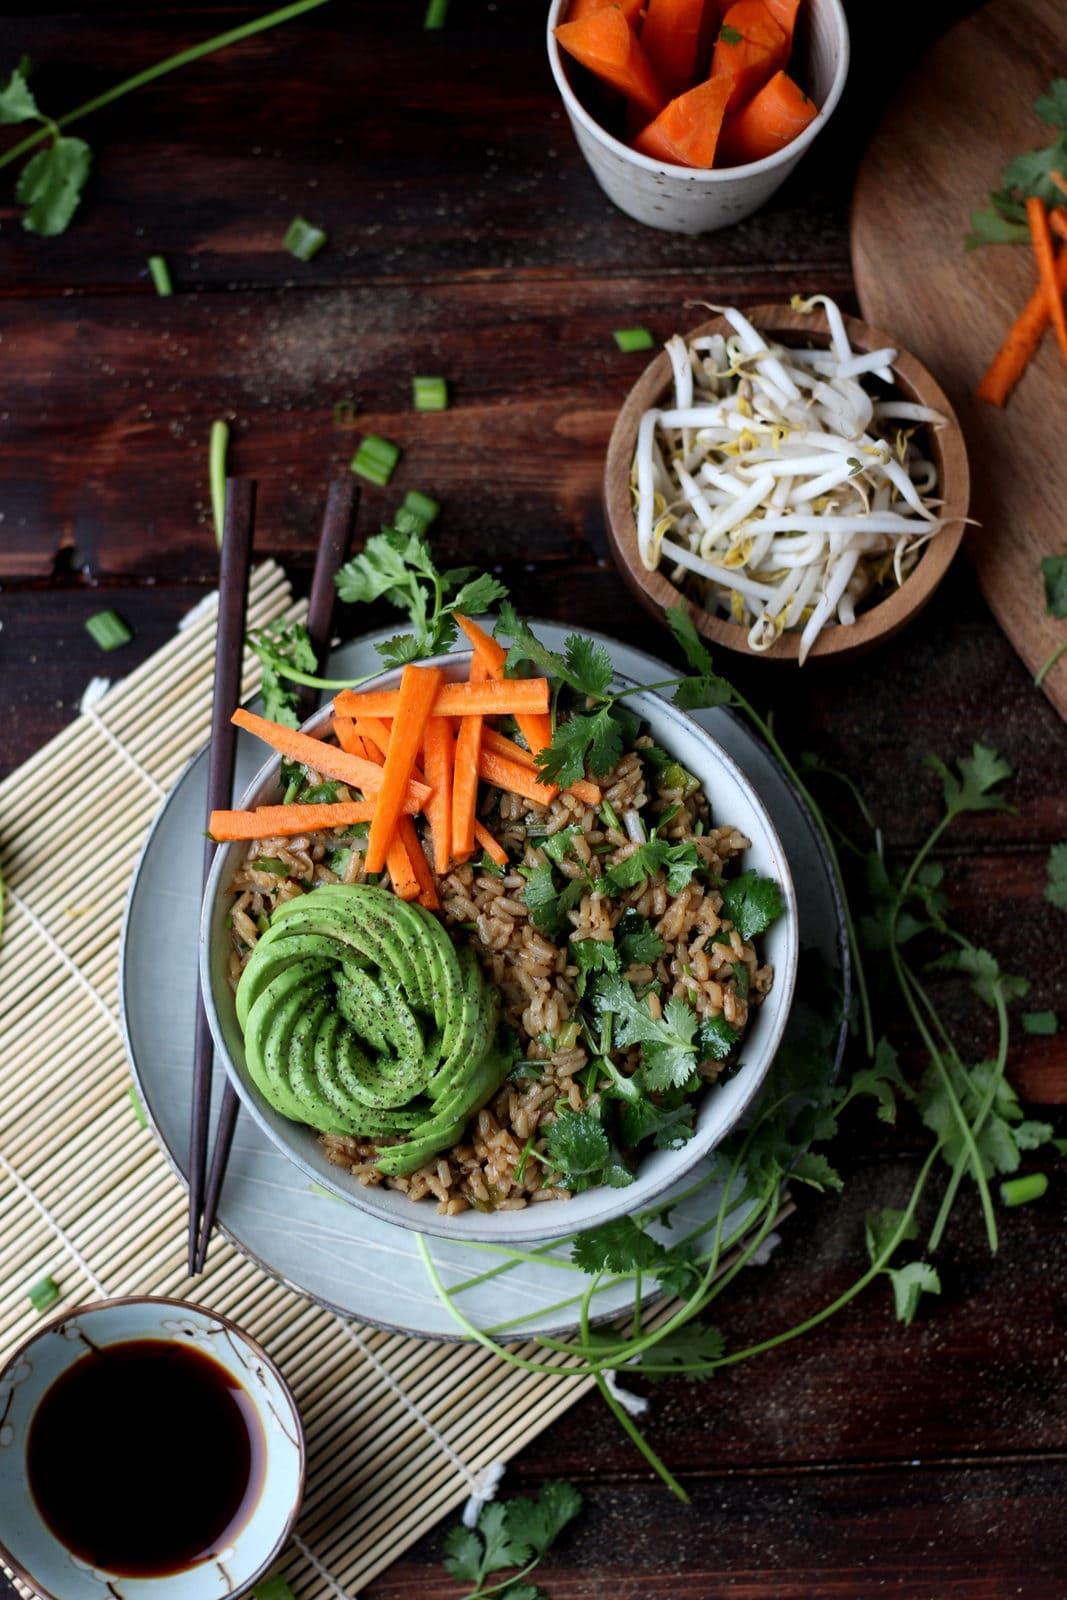 Cilantro Fried Rice + Avocado and Poached Egg - awesome vegetarian rice bowl recipe! thewoodenskillet.com #recipe